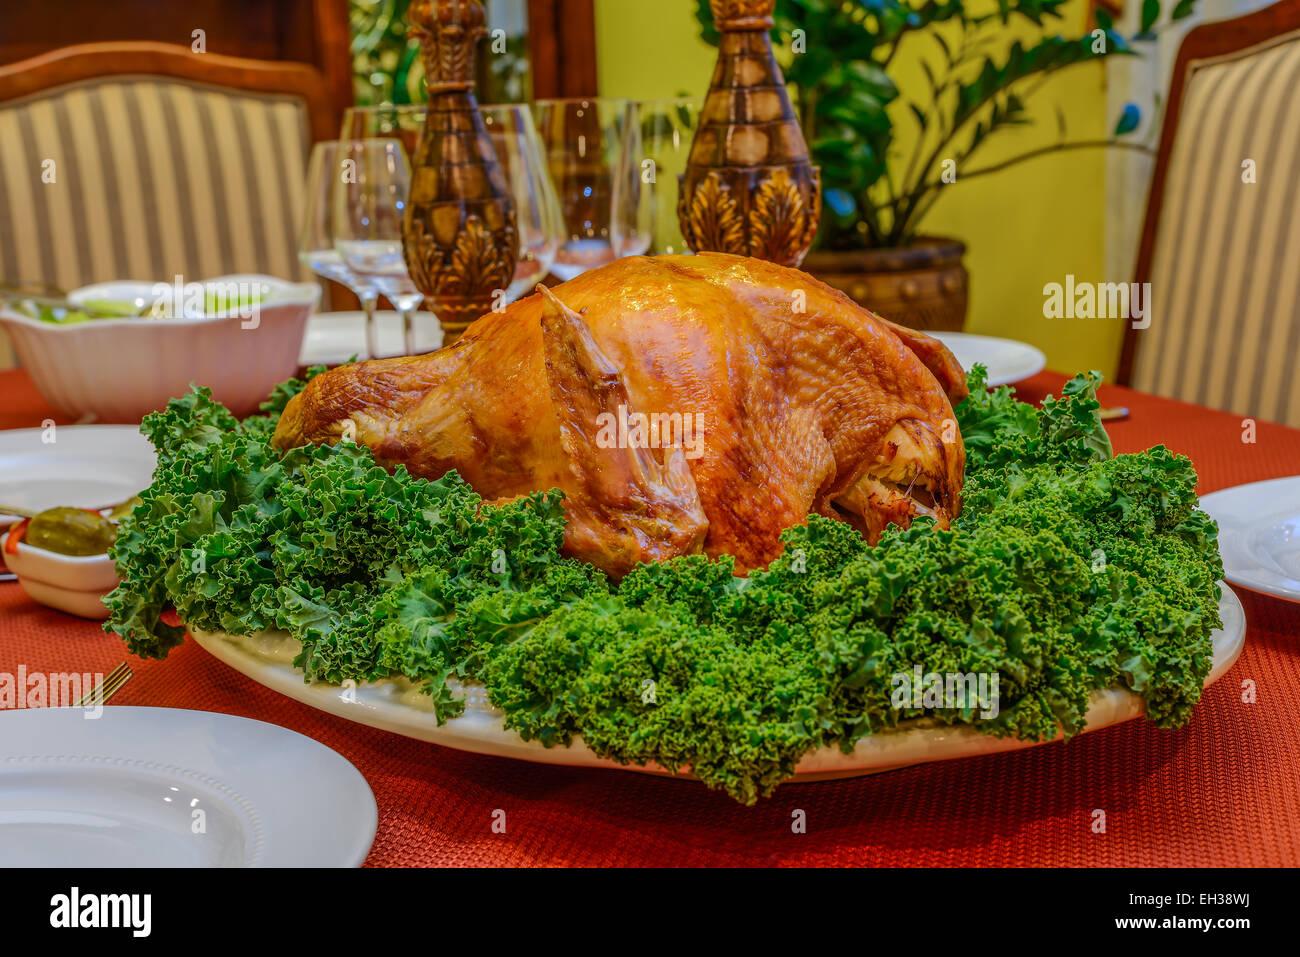 Roasted Turkey On A Platter With Fresh Salad Decoration Stock Photo